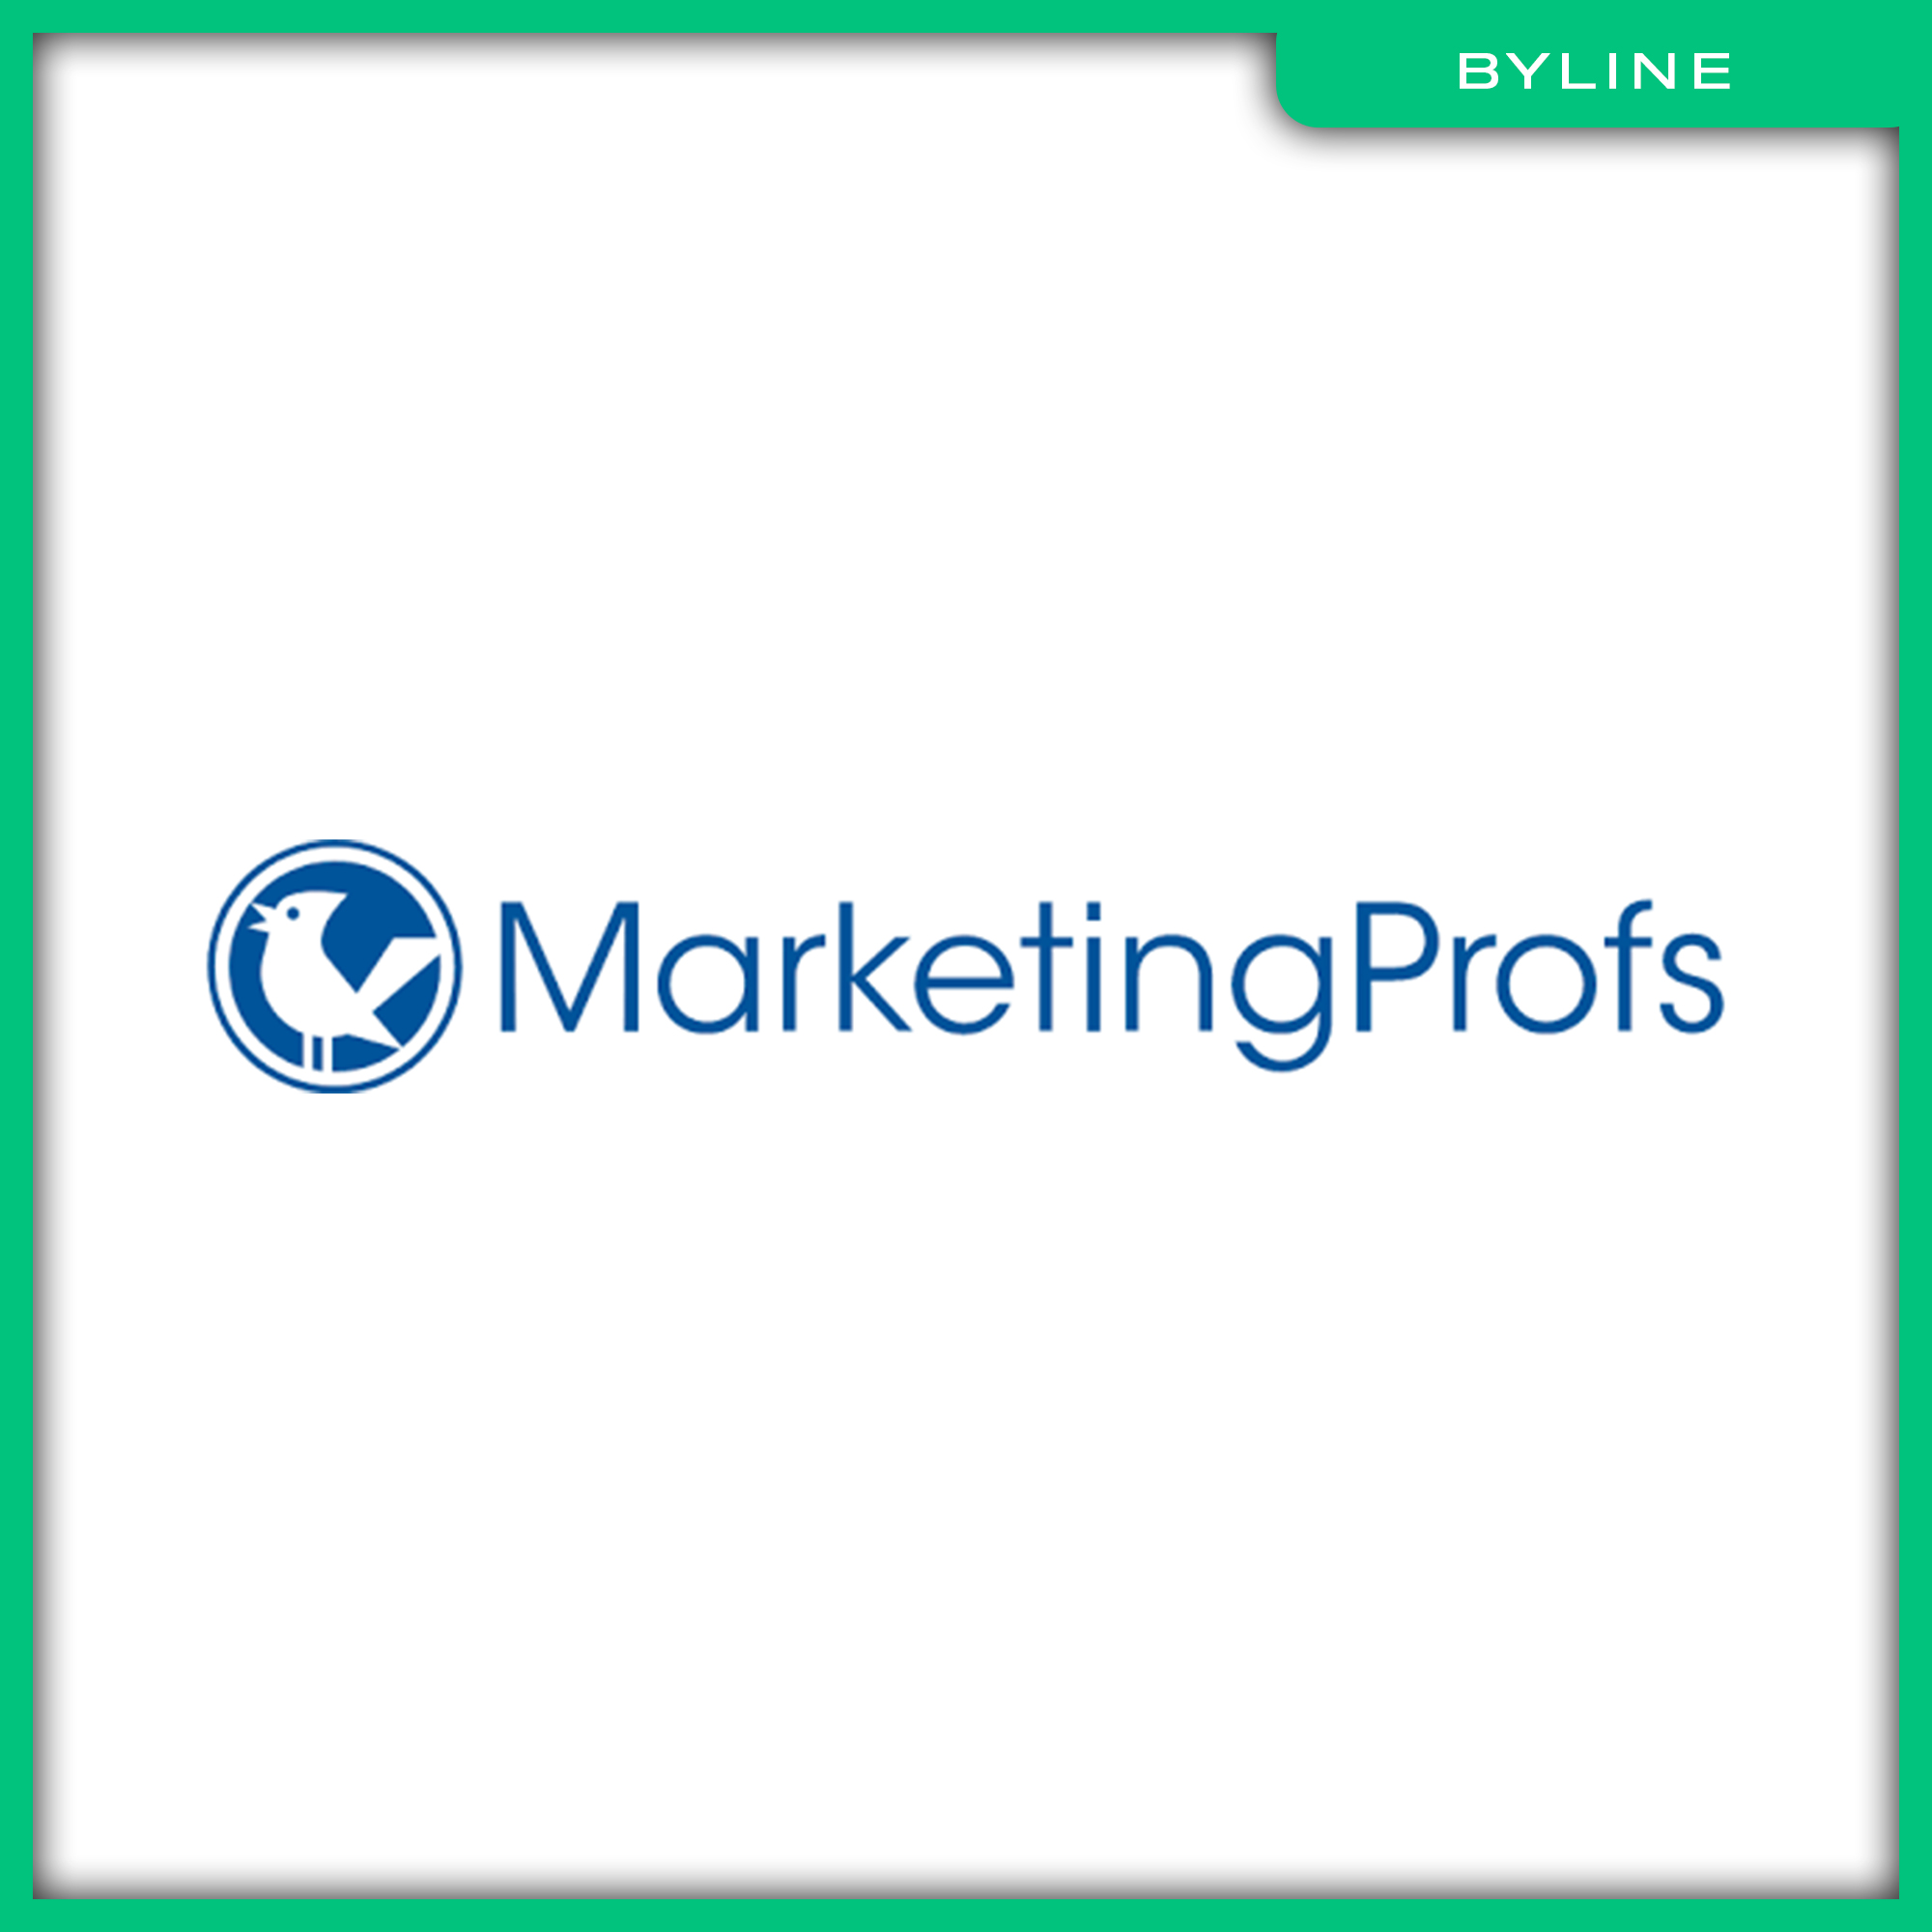 08-Byline--MarketingProfs--Your-New-Content-Marketing-Engine